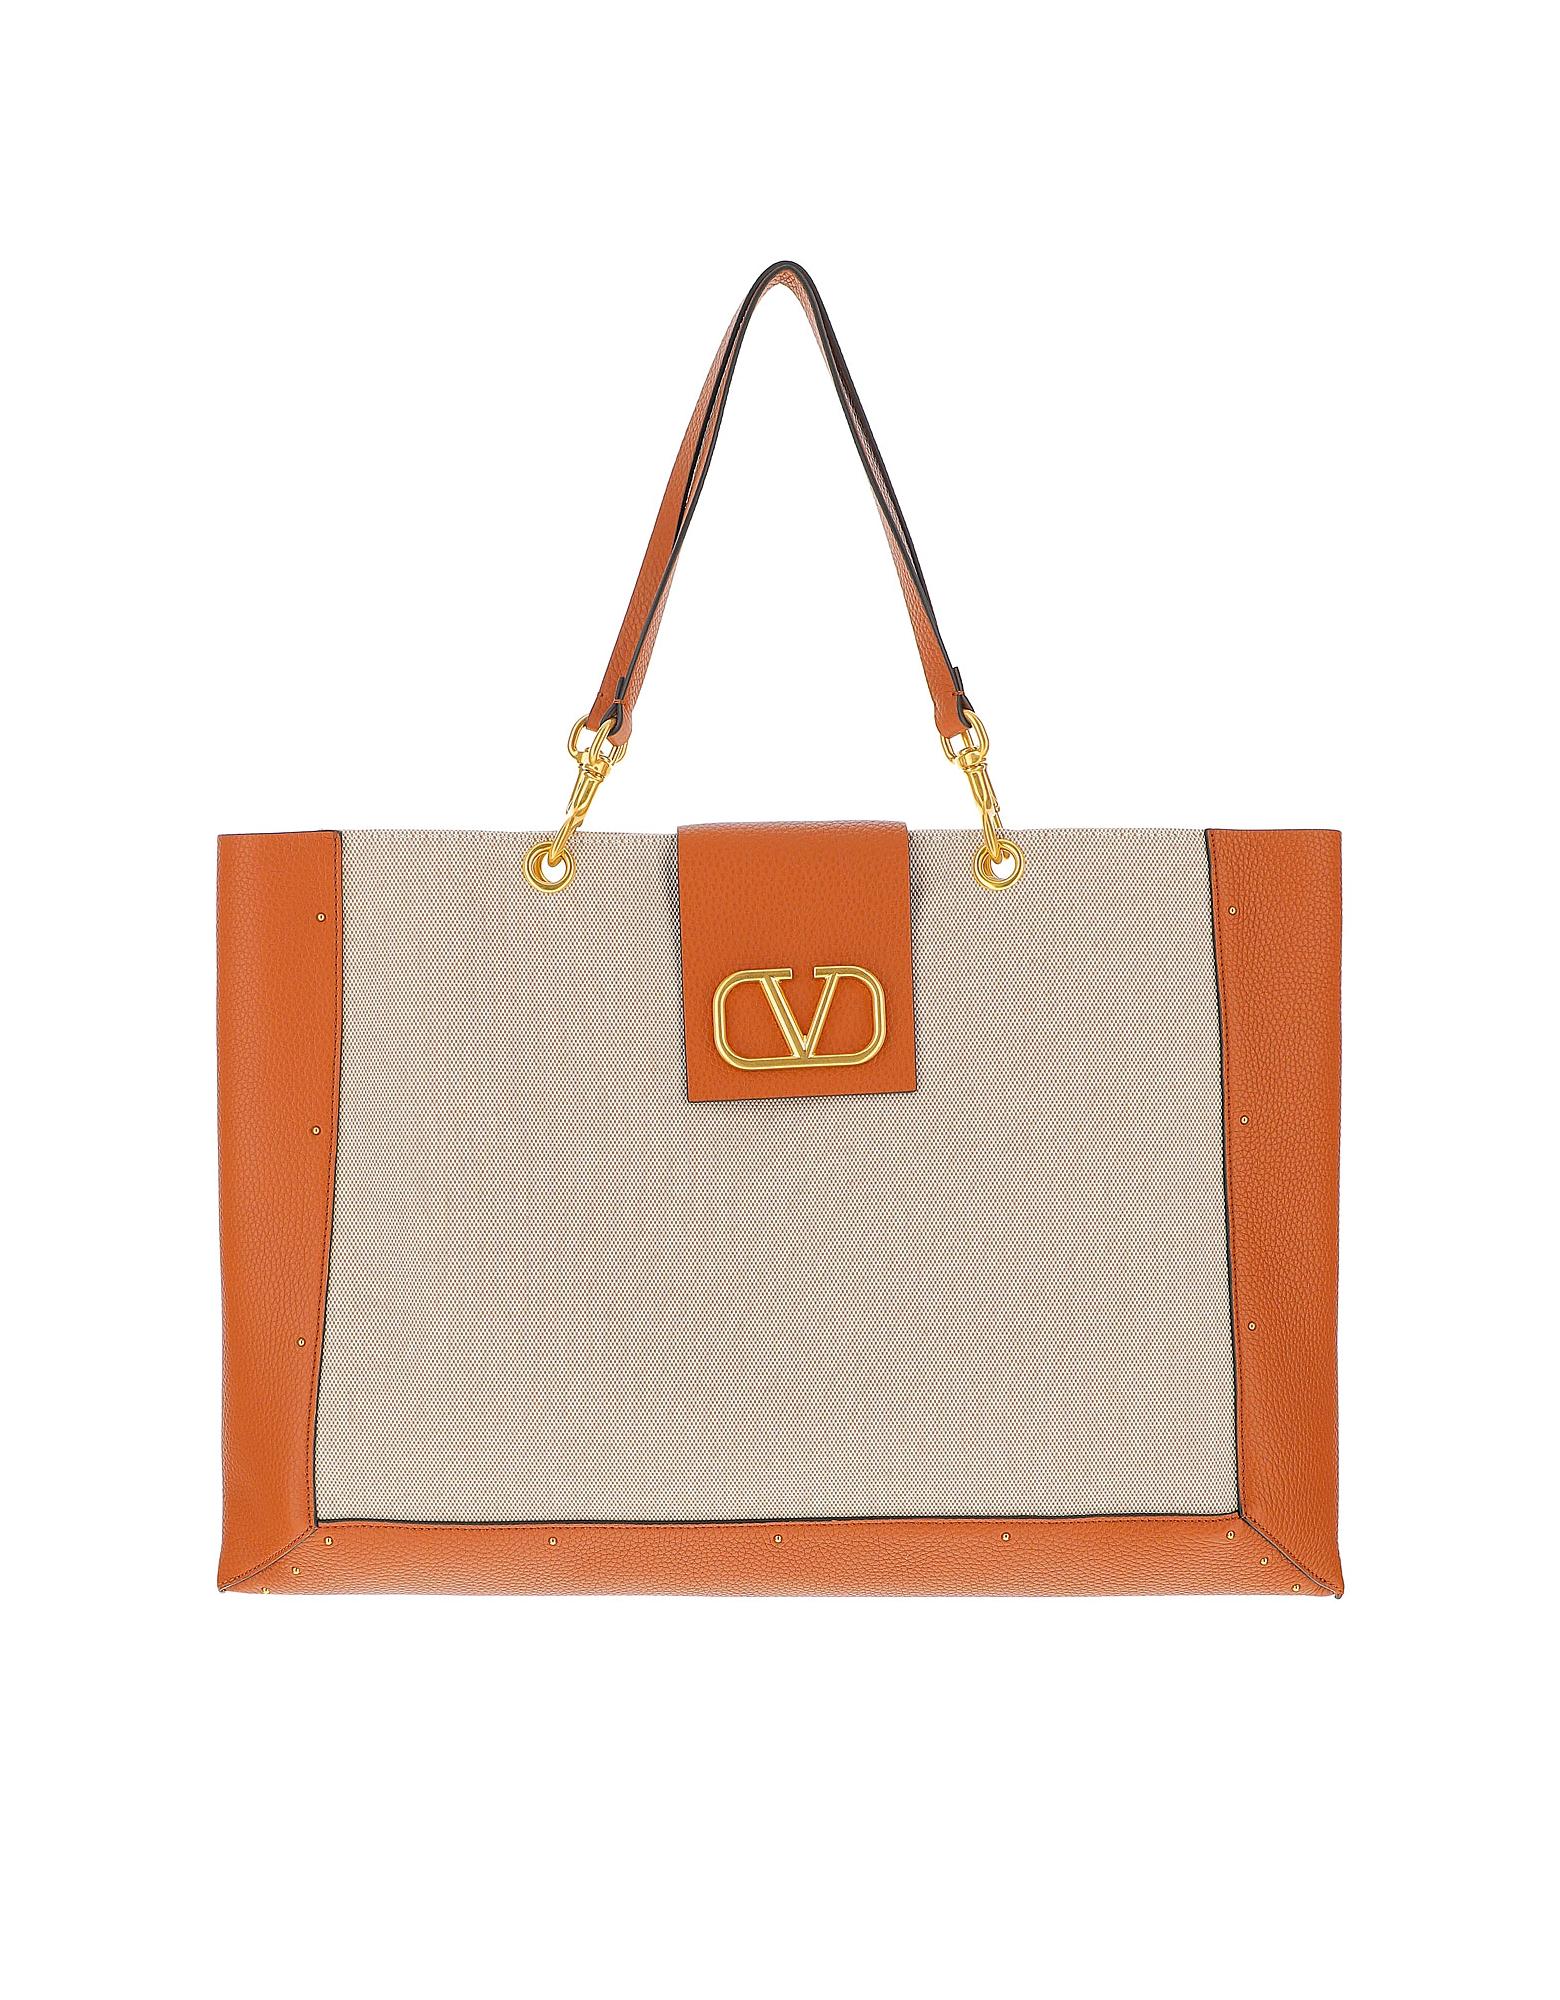 Valentino Designer Handbags, Vlogo Canvas & Leather Shopping Bag